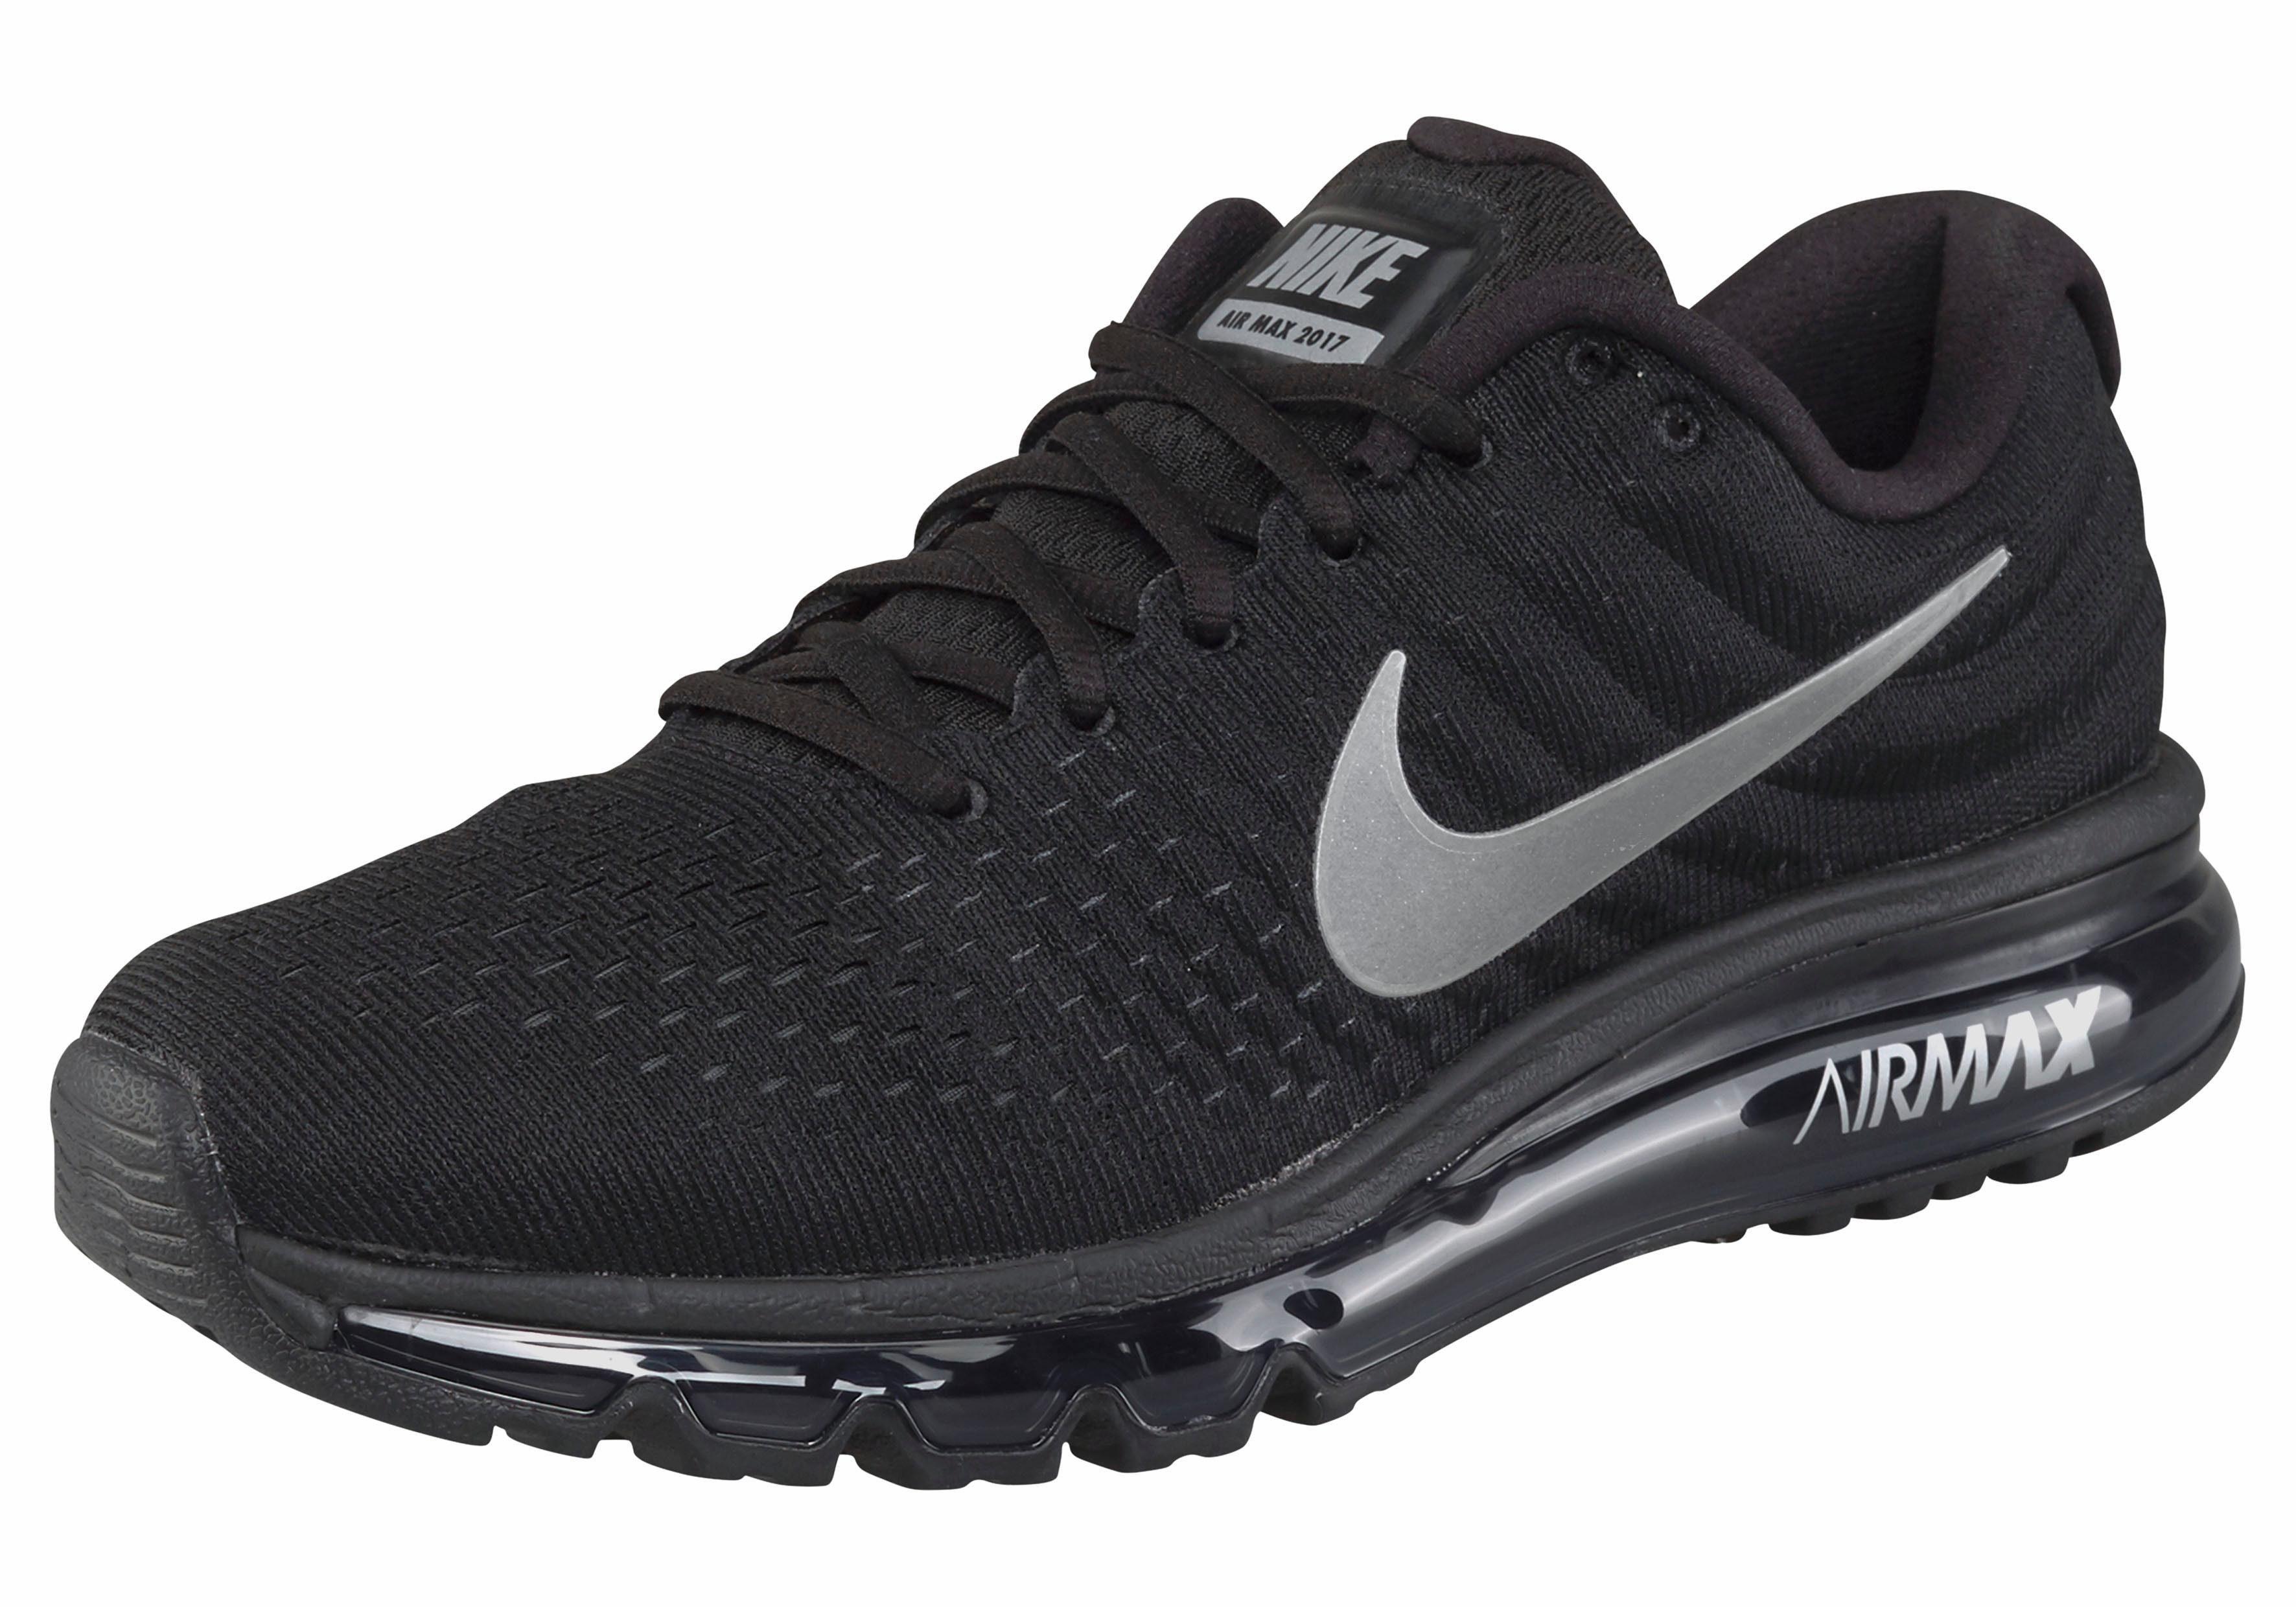 2017 »Air M« Sportswear Max Nike Sneaker ywvnON0m8P